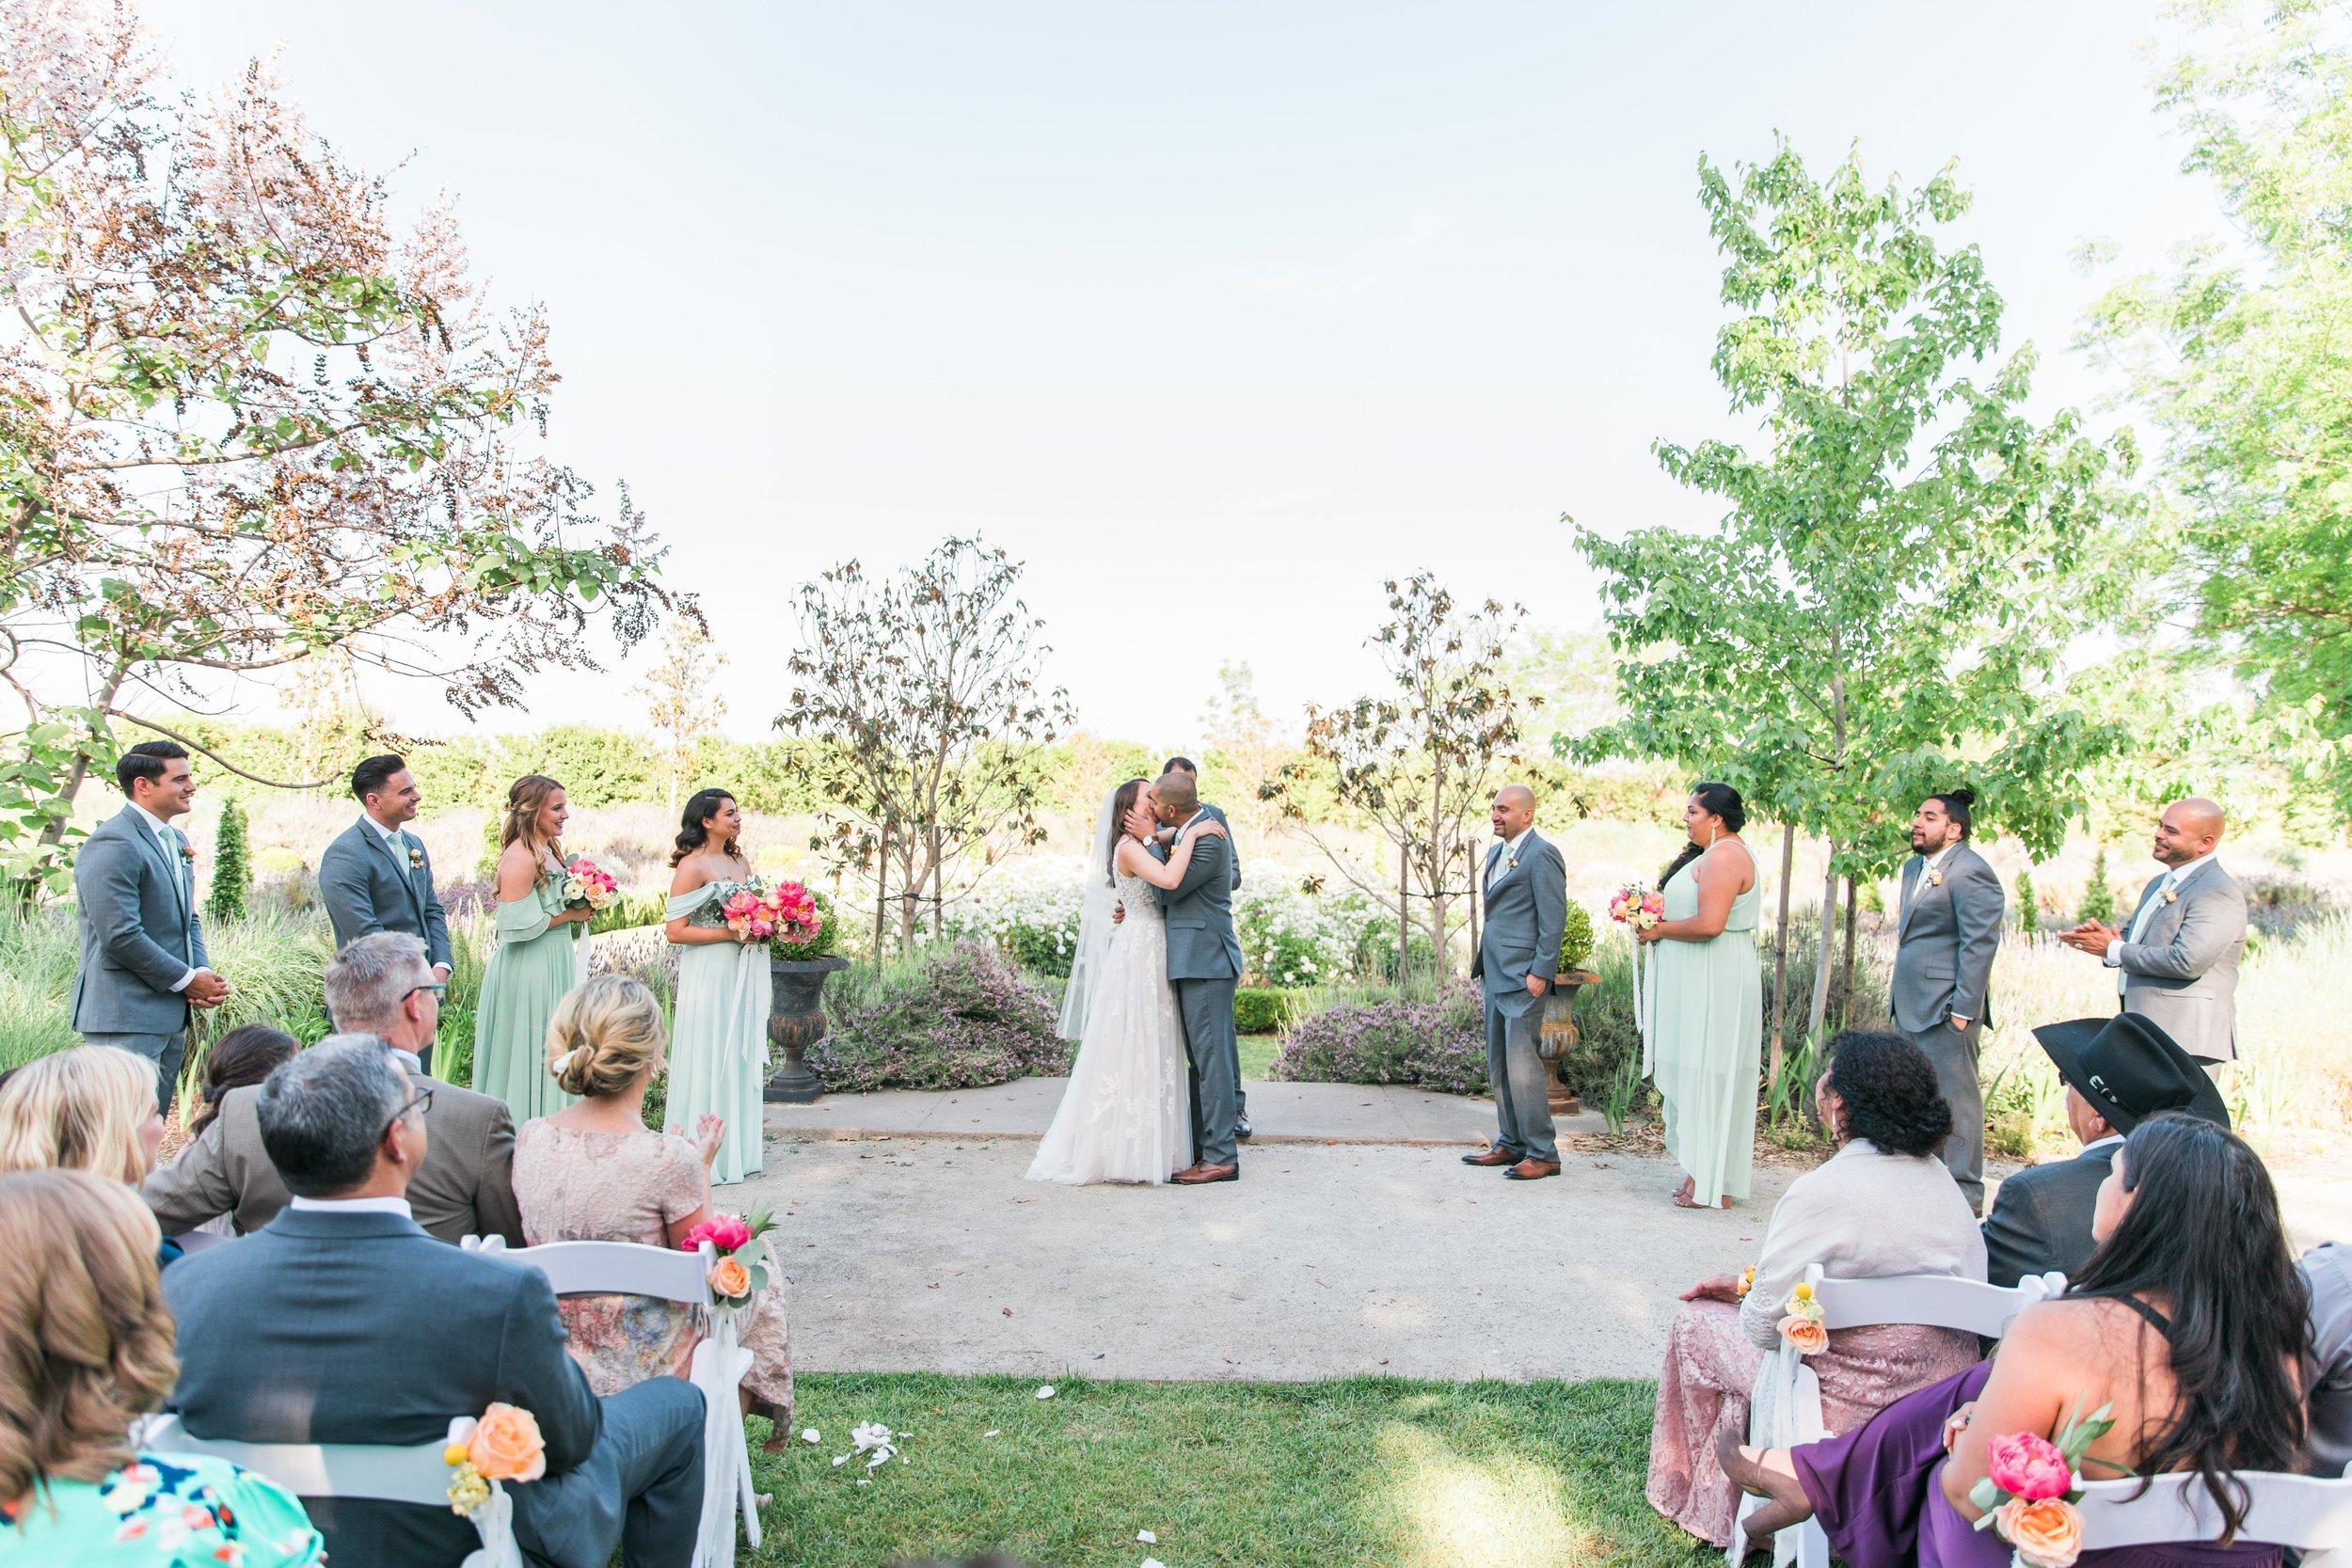 Tess-Jesse-Wedding-SP-by-JBJ-Pictures-12.jpg